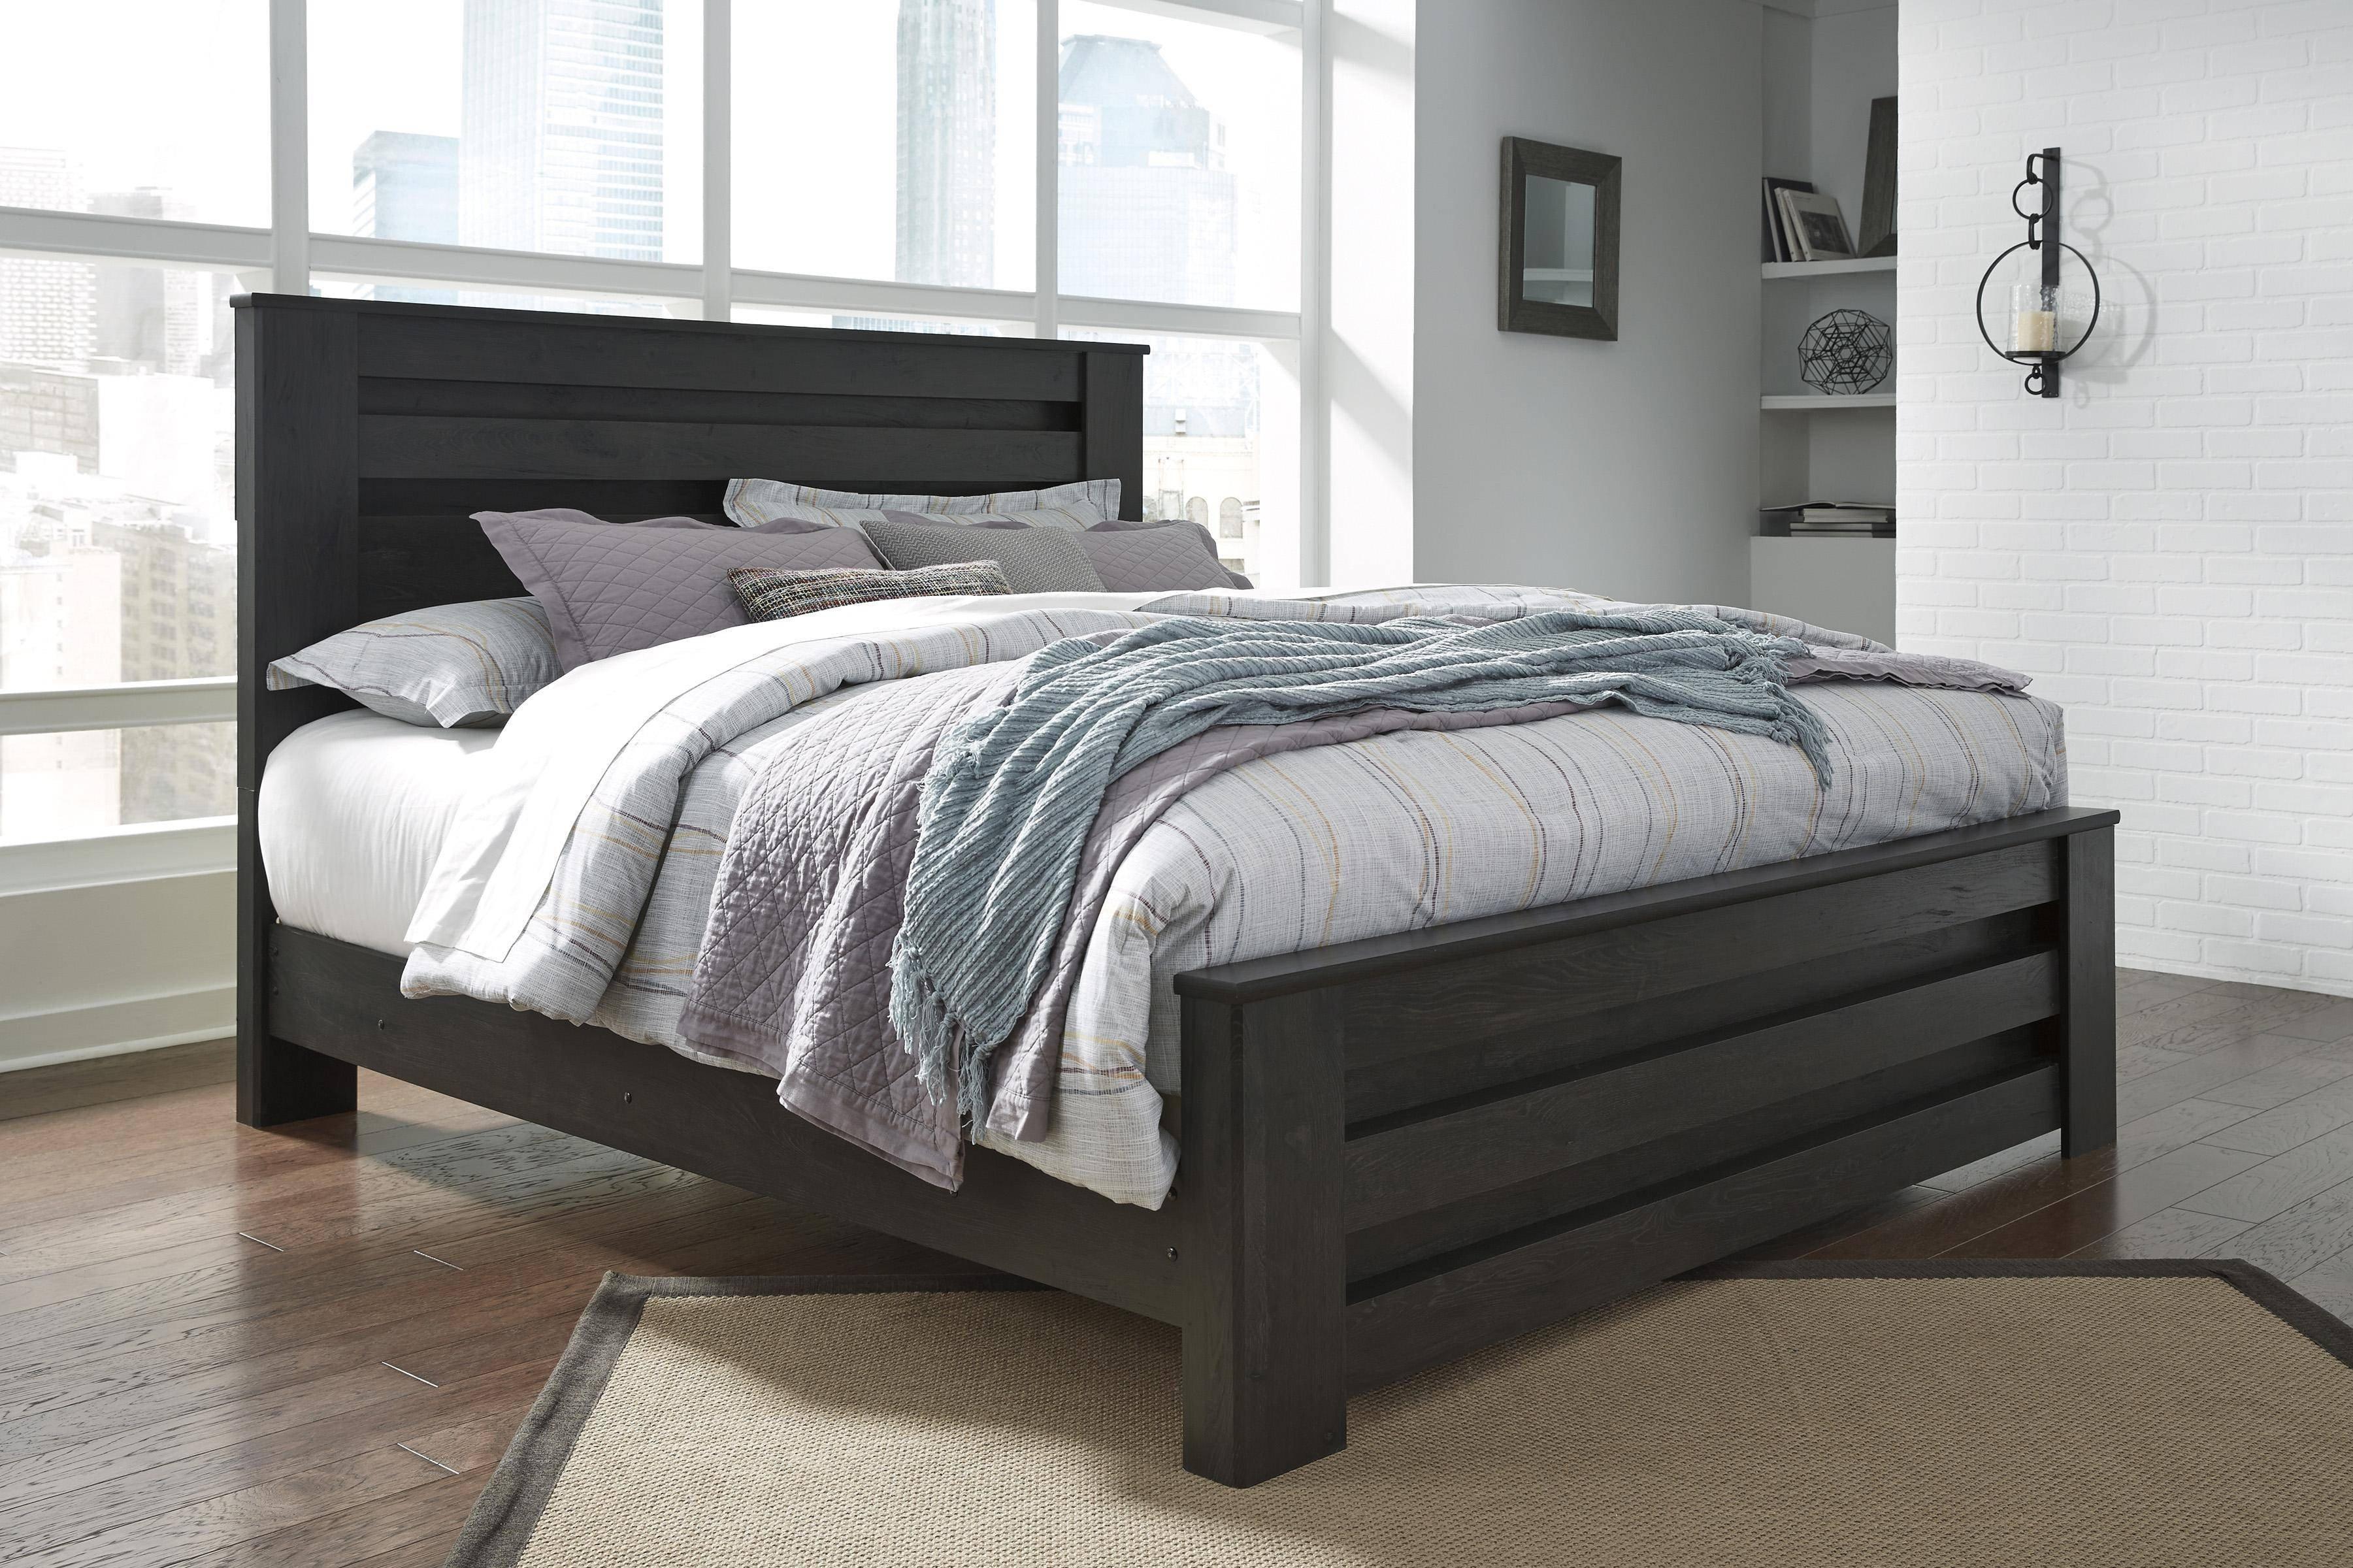 Ashley Furniture Bedroom Set 14 Piece Awesome ashley Brinxton B249 King Size Platform Bedroom Set 6pcs In